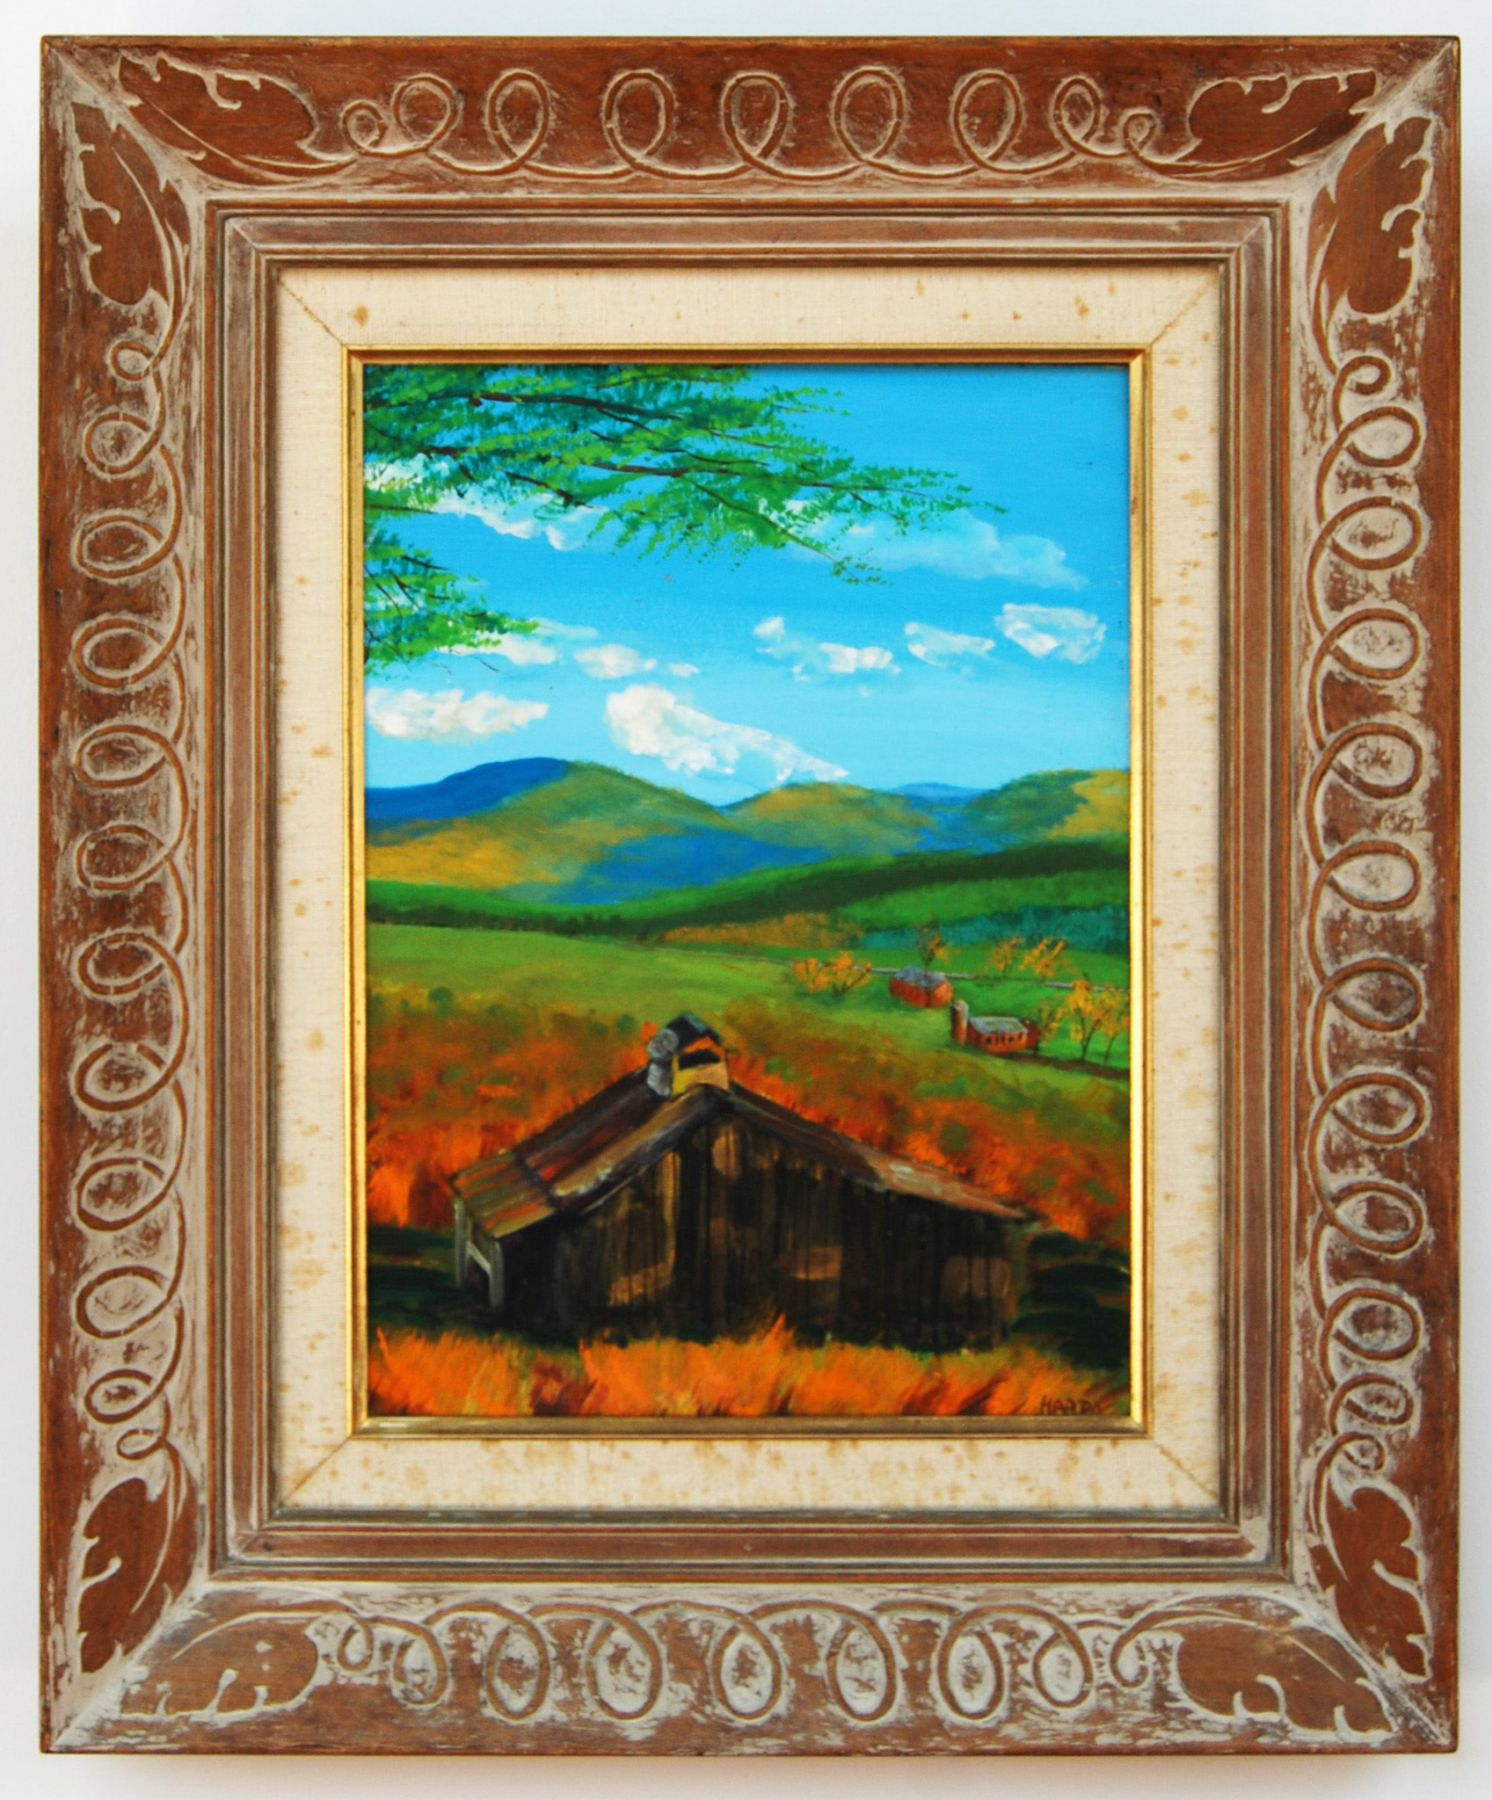 Harpo Marx, Untitled Midwest Landscape